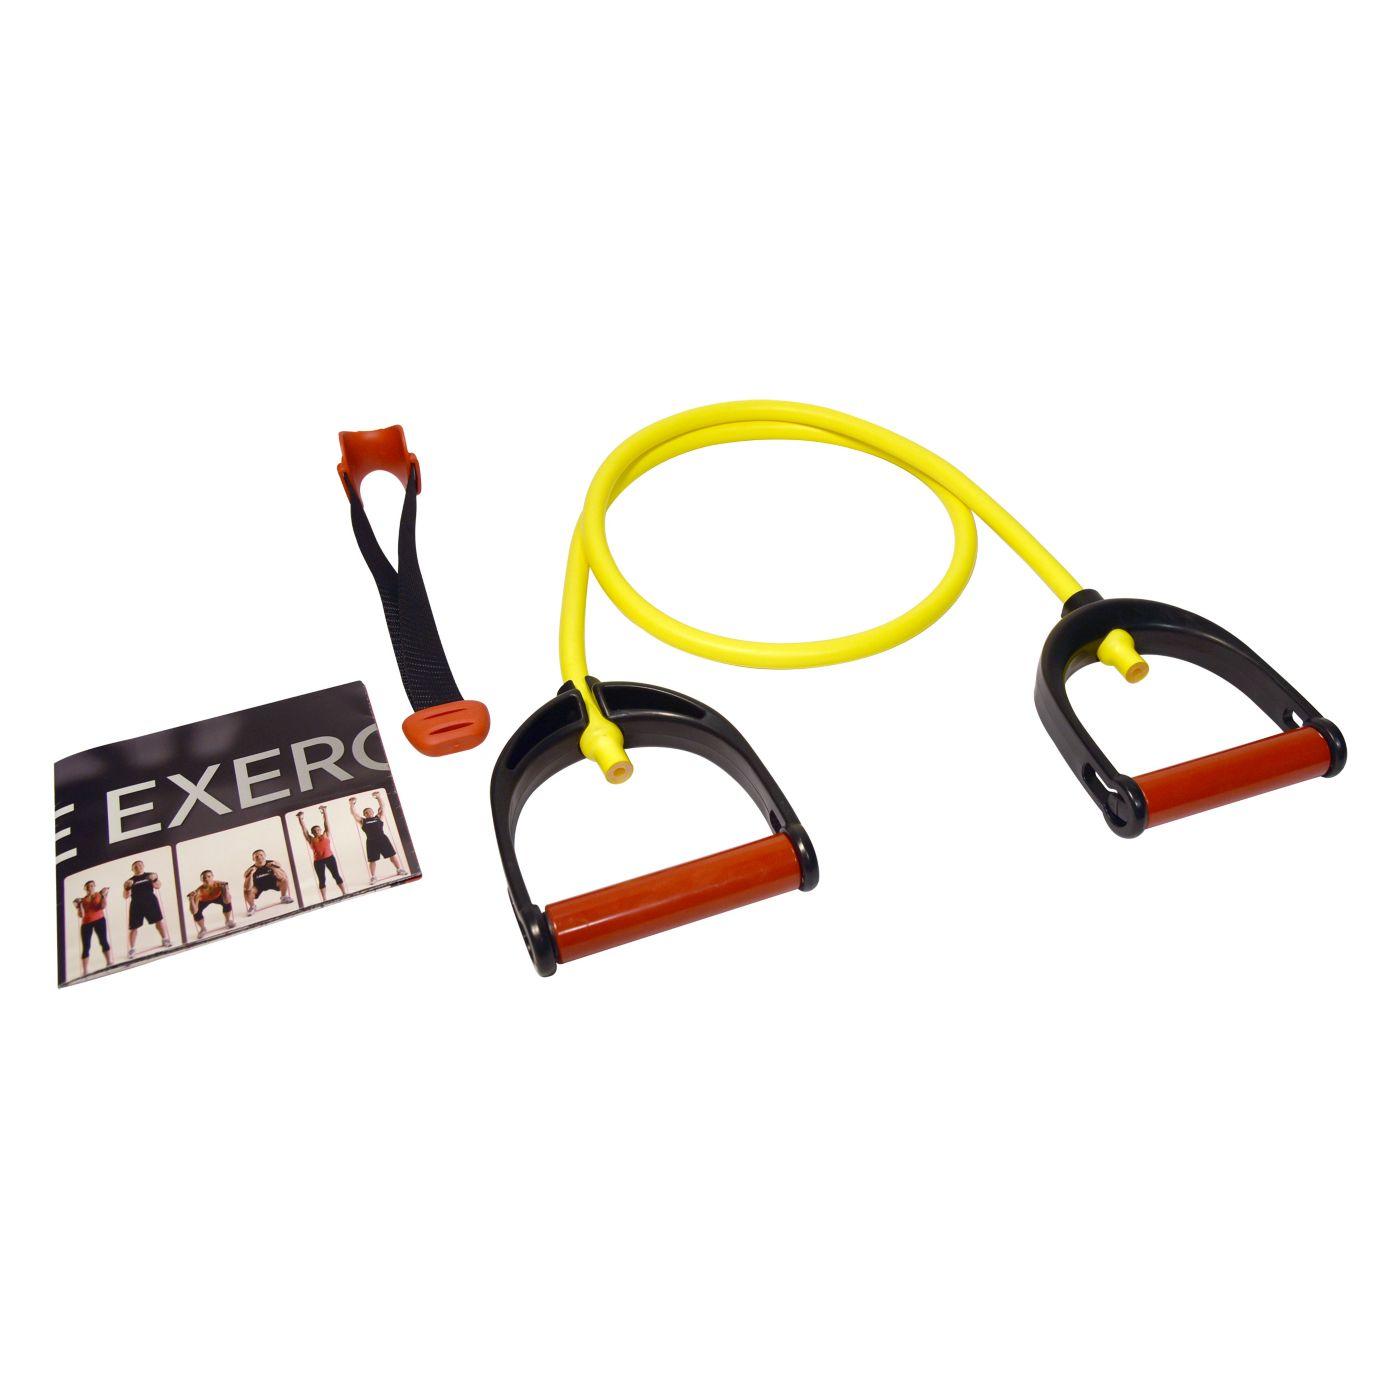 Lifeline Power Cable - 70LBS